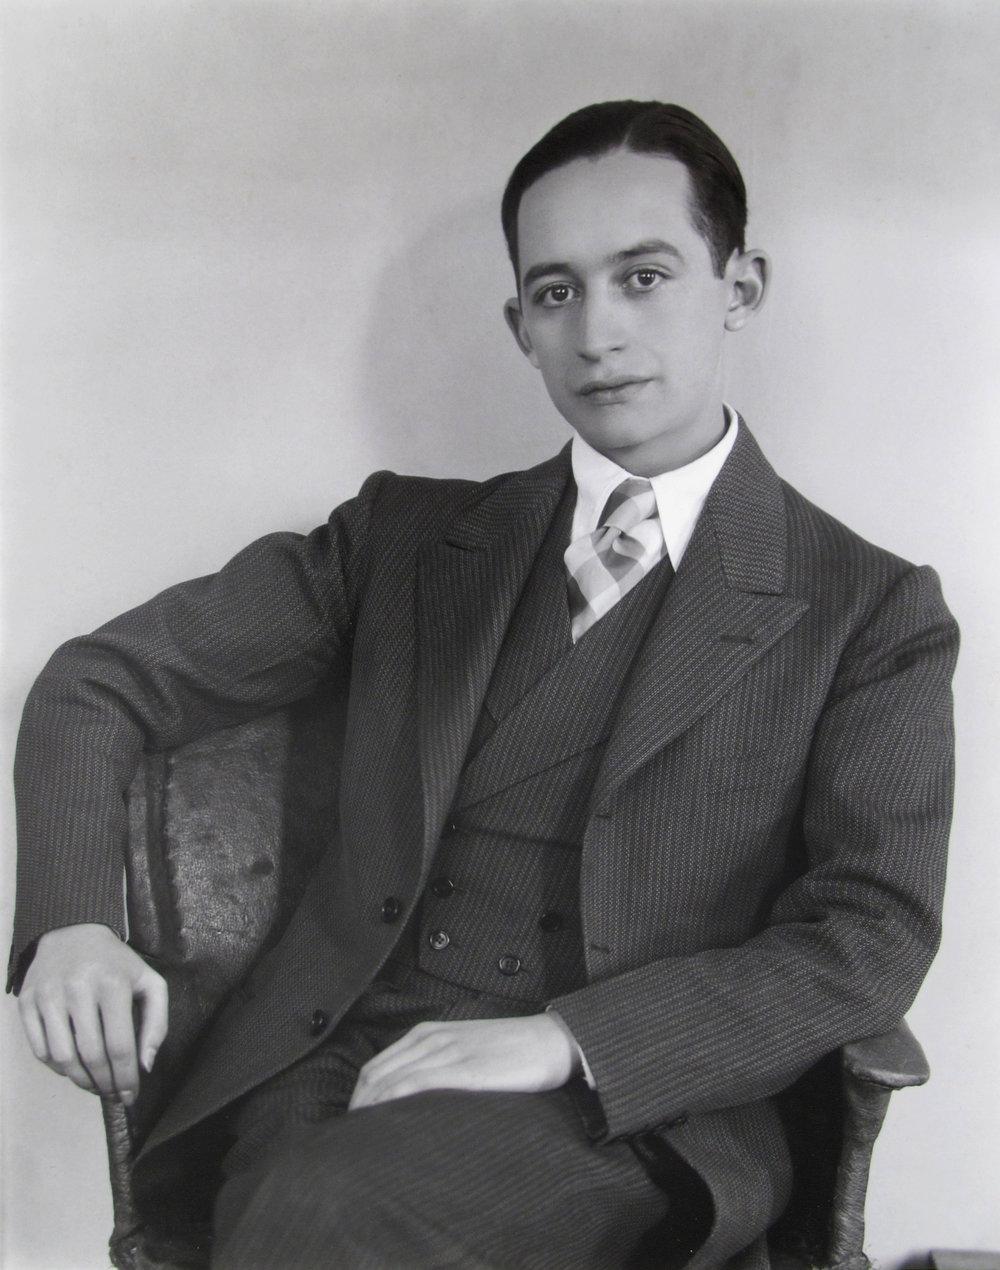 Manuel Alvarez Bravo  Xavier Villaurrutia , 1930-40 8 x 10 inches Silver Print